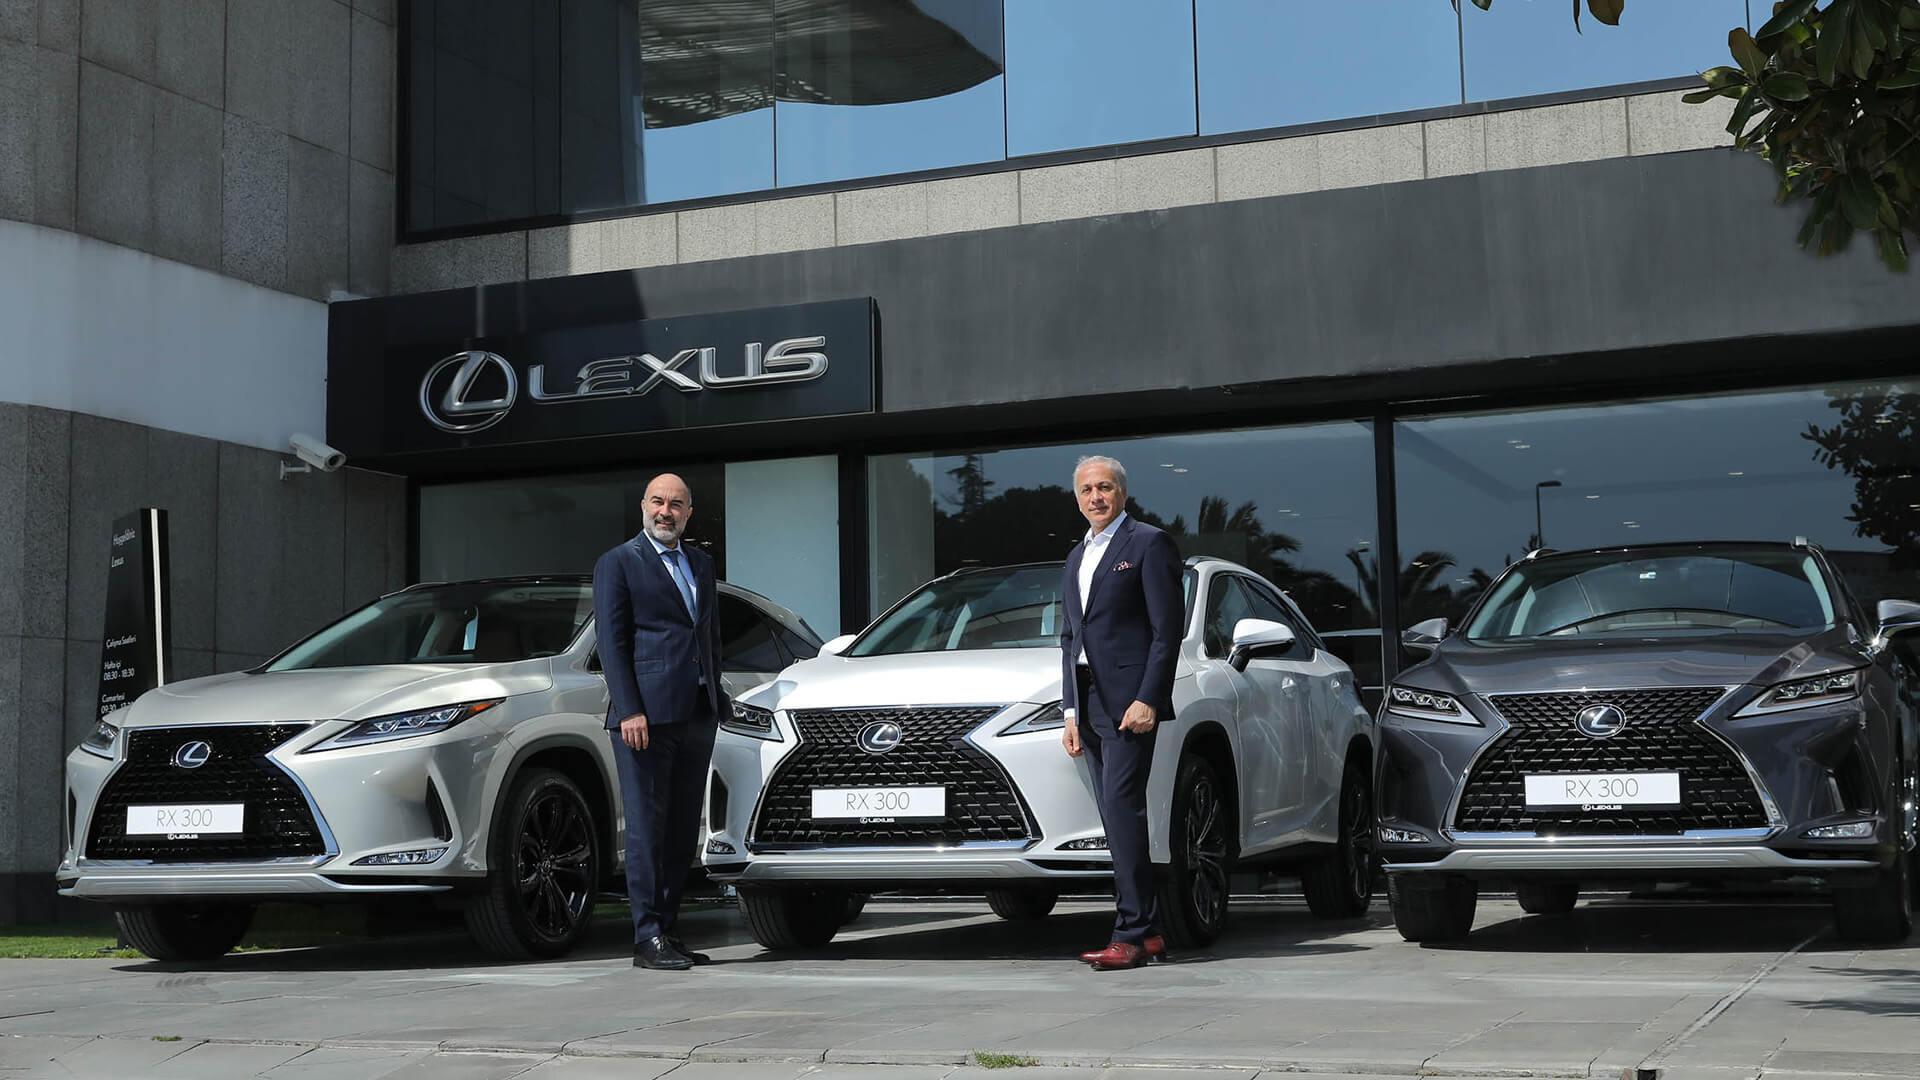 Dünyanın İlk Premium SUV'u Lexus RX gallery01